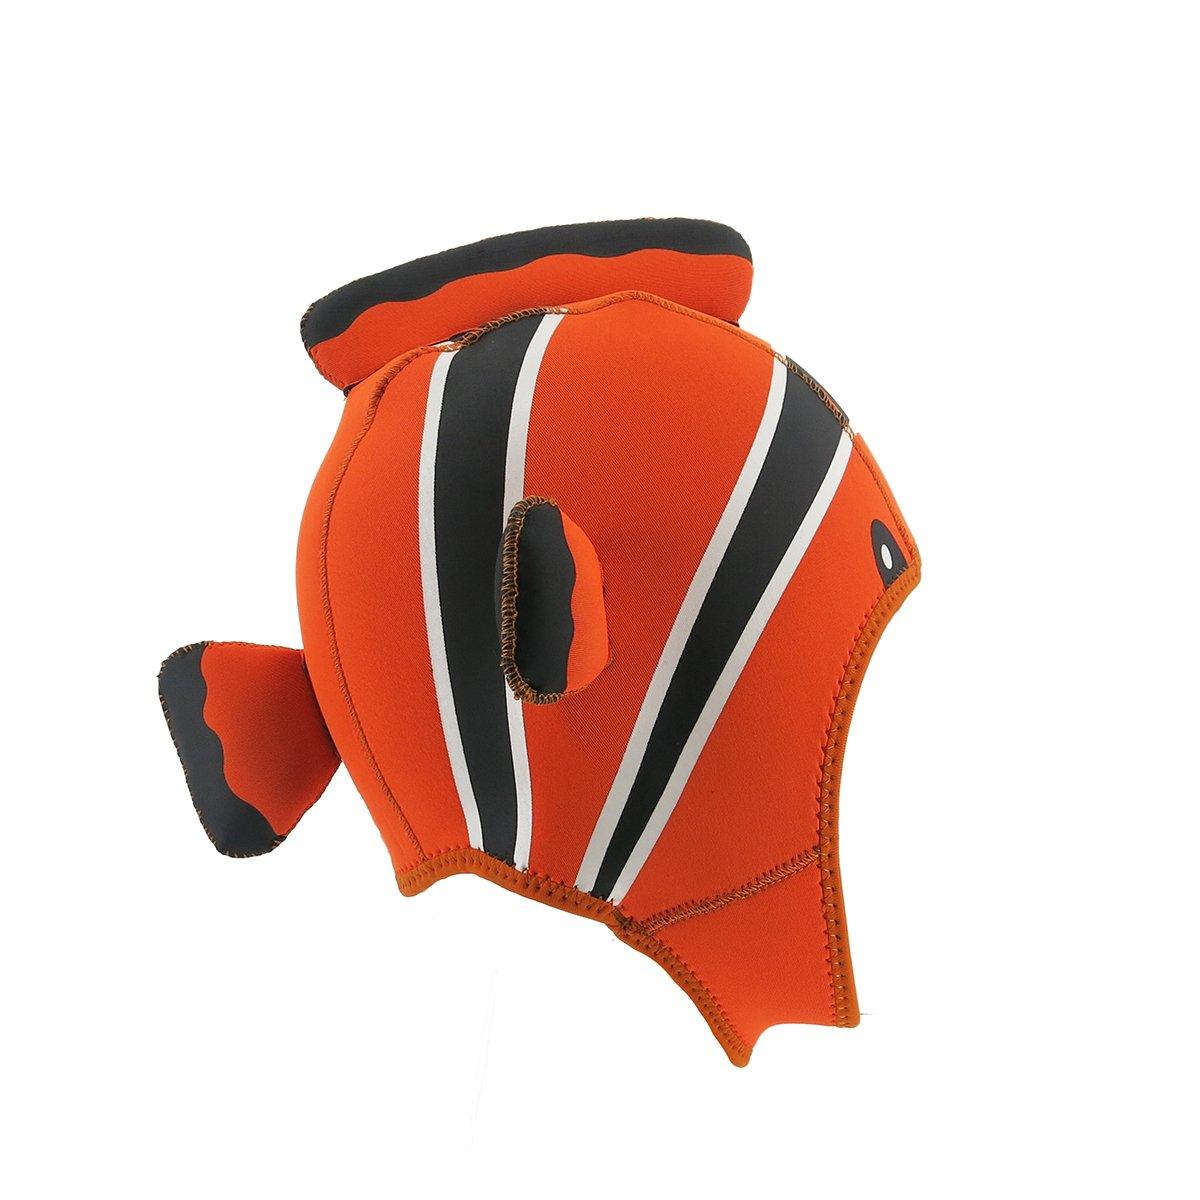 Kinno Scuba Wetsuit Hood, Nemo Premium Neoprene 3mm Vented Scuba Diving Hoods for Scuba Diving, Snorkeling, Spearfishing by Kinno Scuba